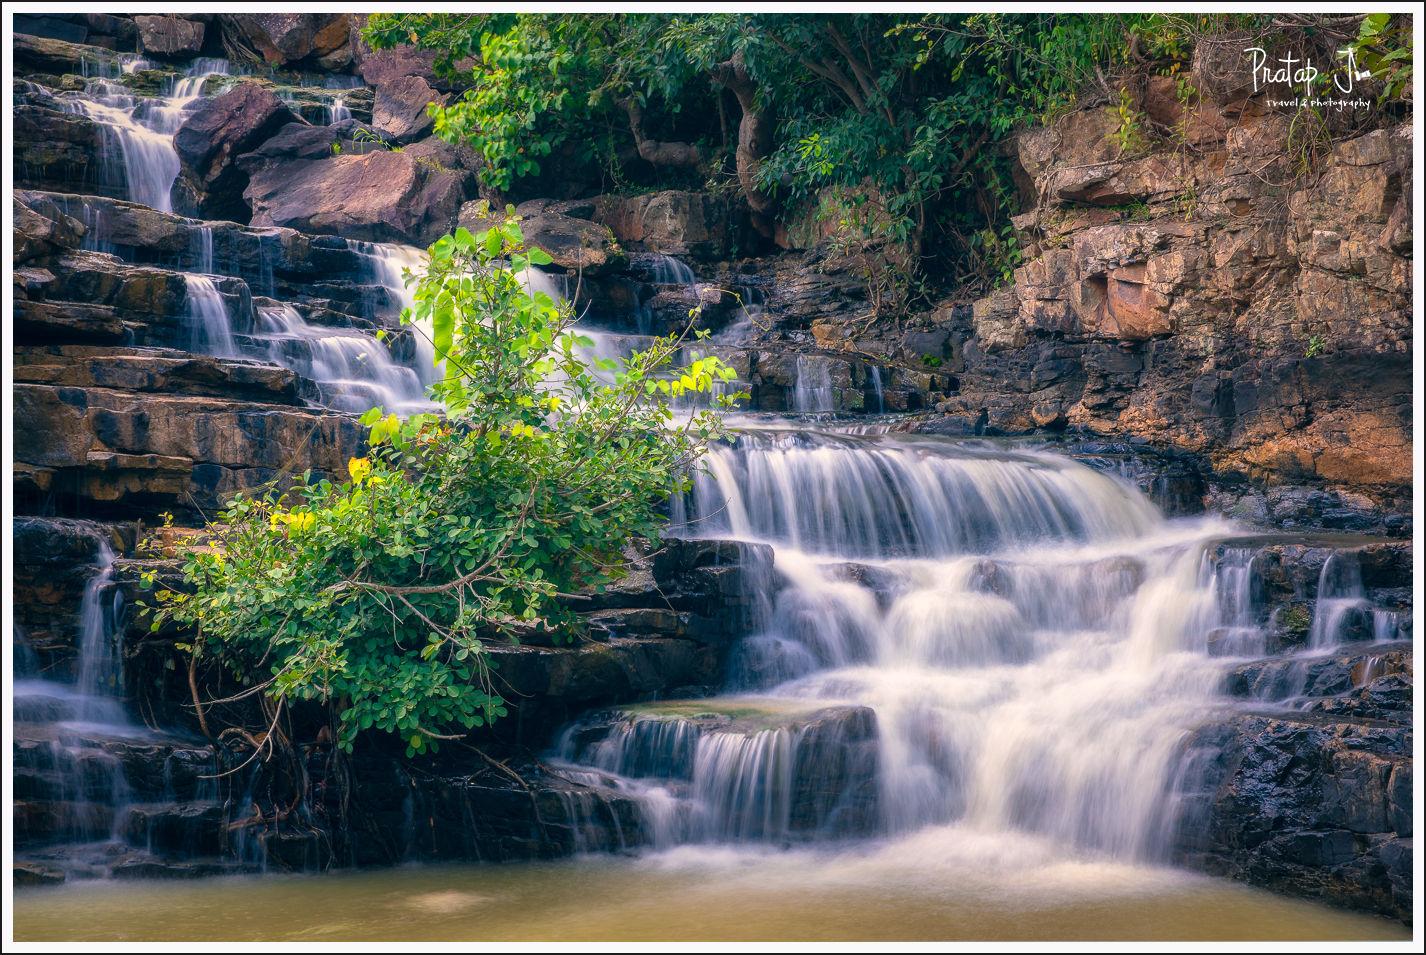 Chitradhara Waterfall in October